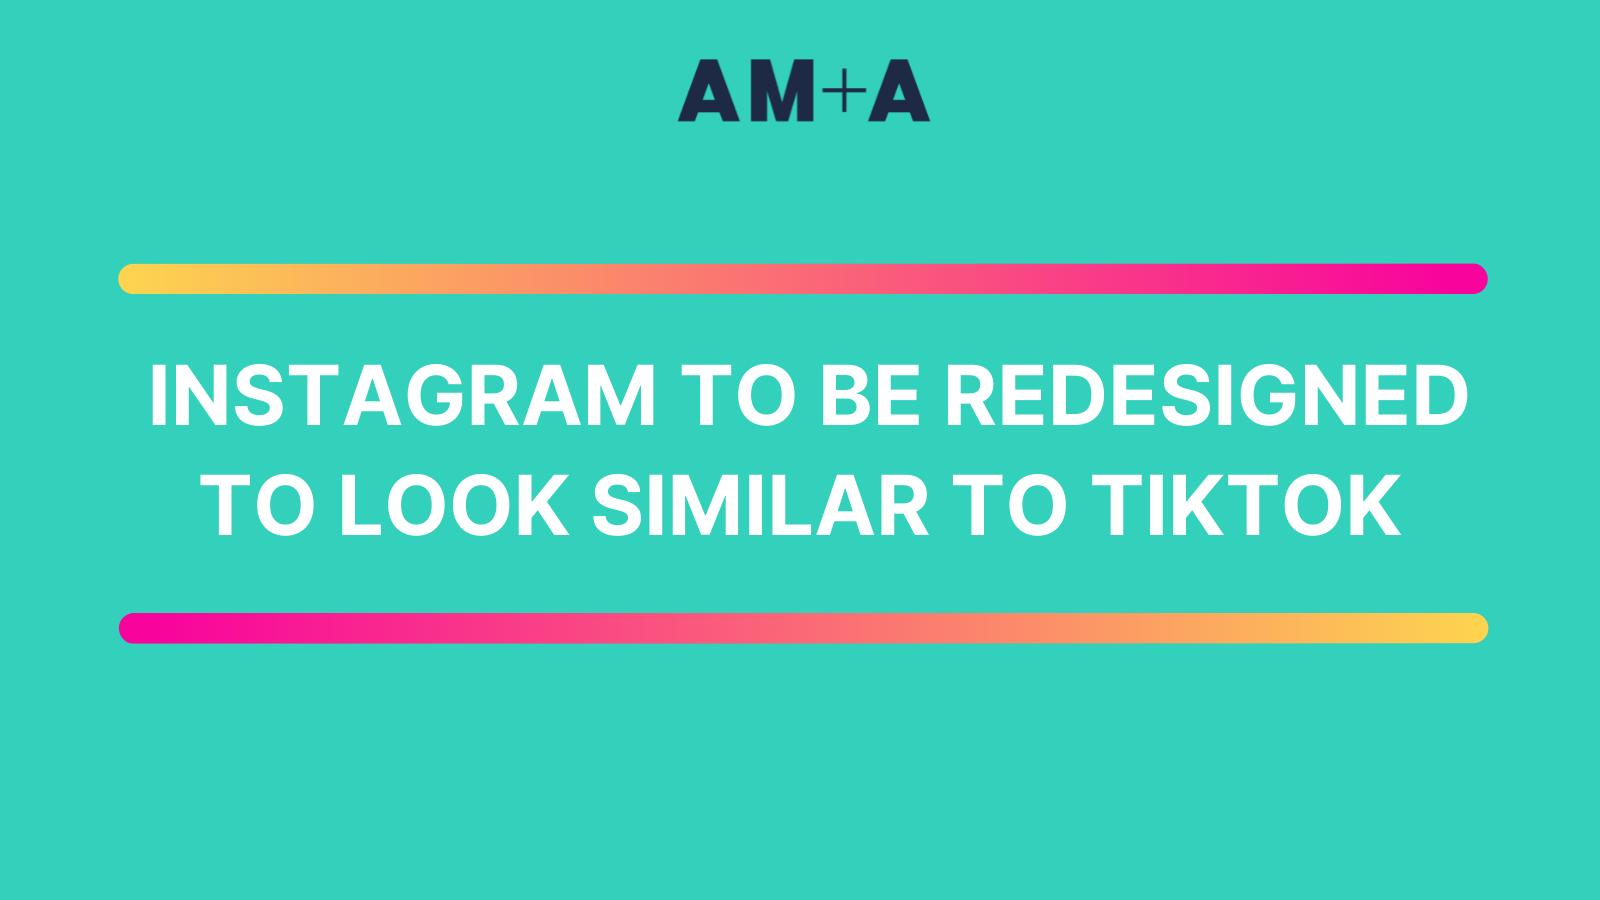 Facebook confirms plan to redesign Instagram into TikTok